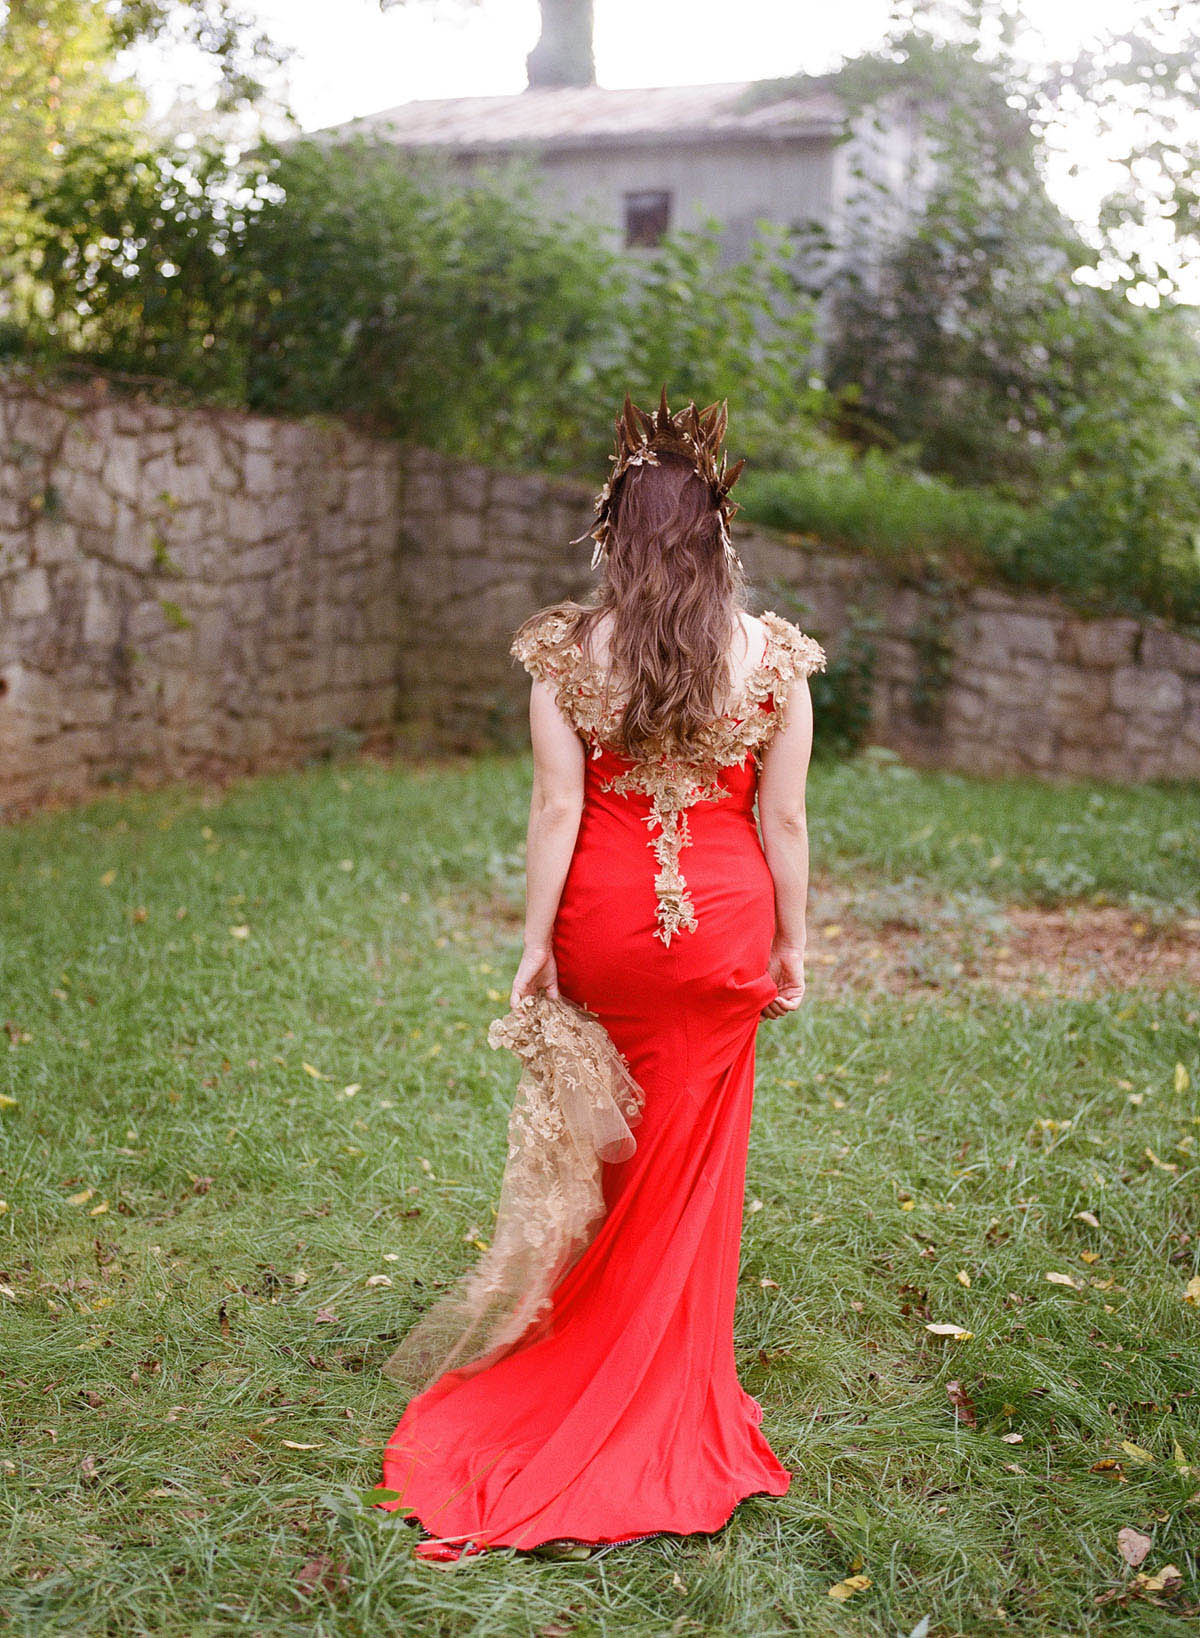 25-bride-red-wedding-dress.jpg